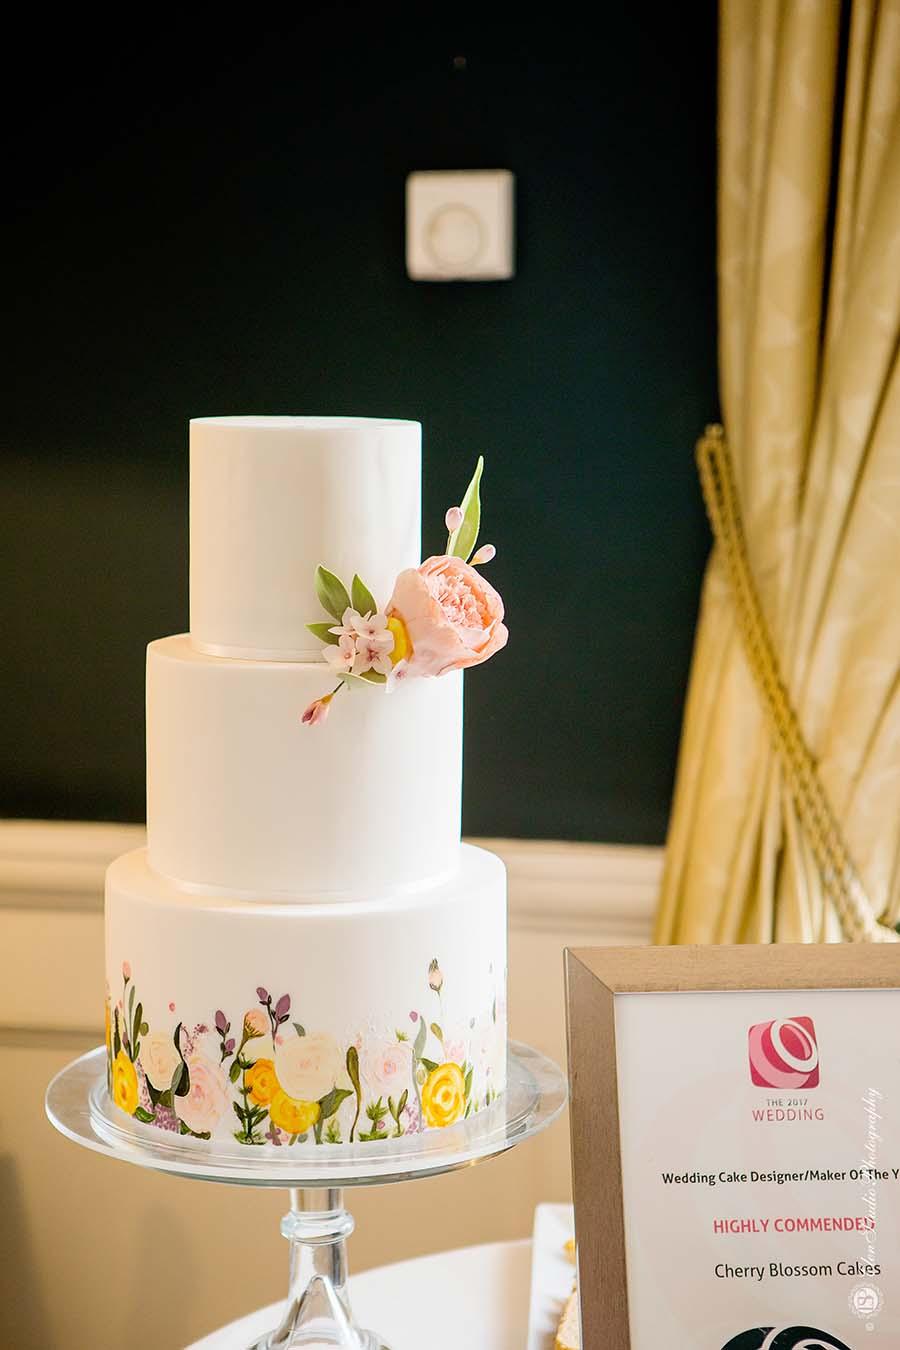 Hodsock-priory-wedding-fair-Elen-Studio-Photography-005